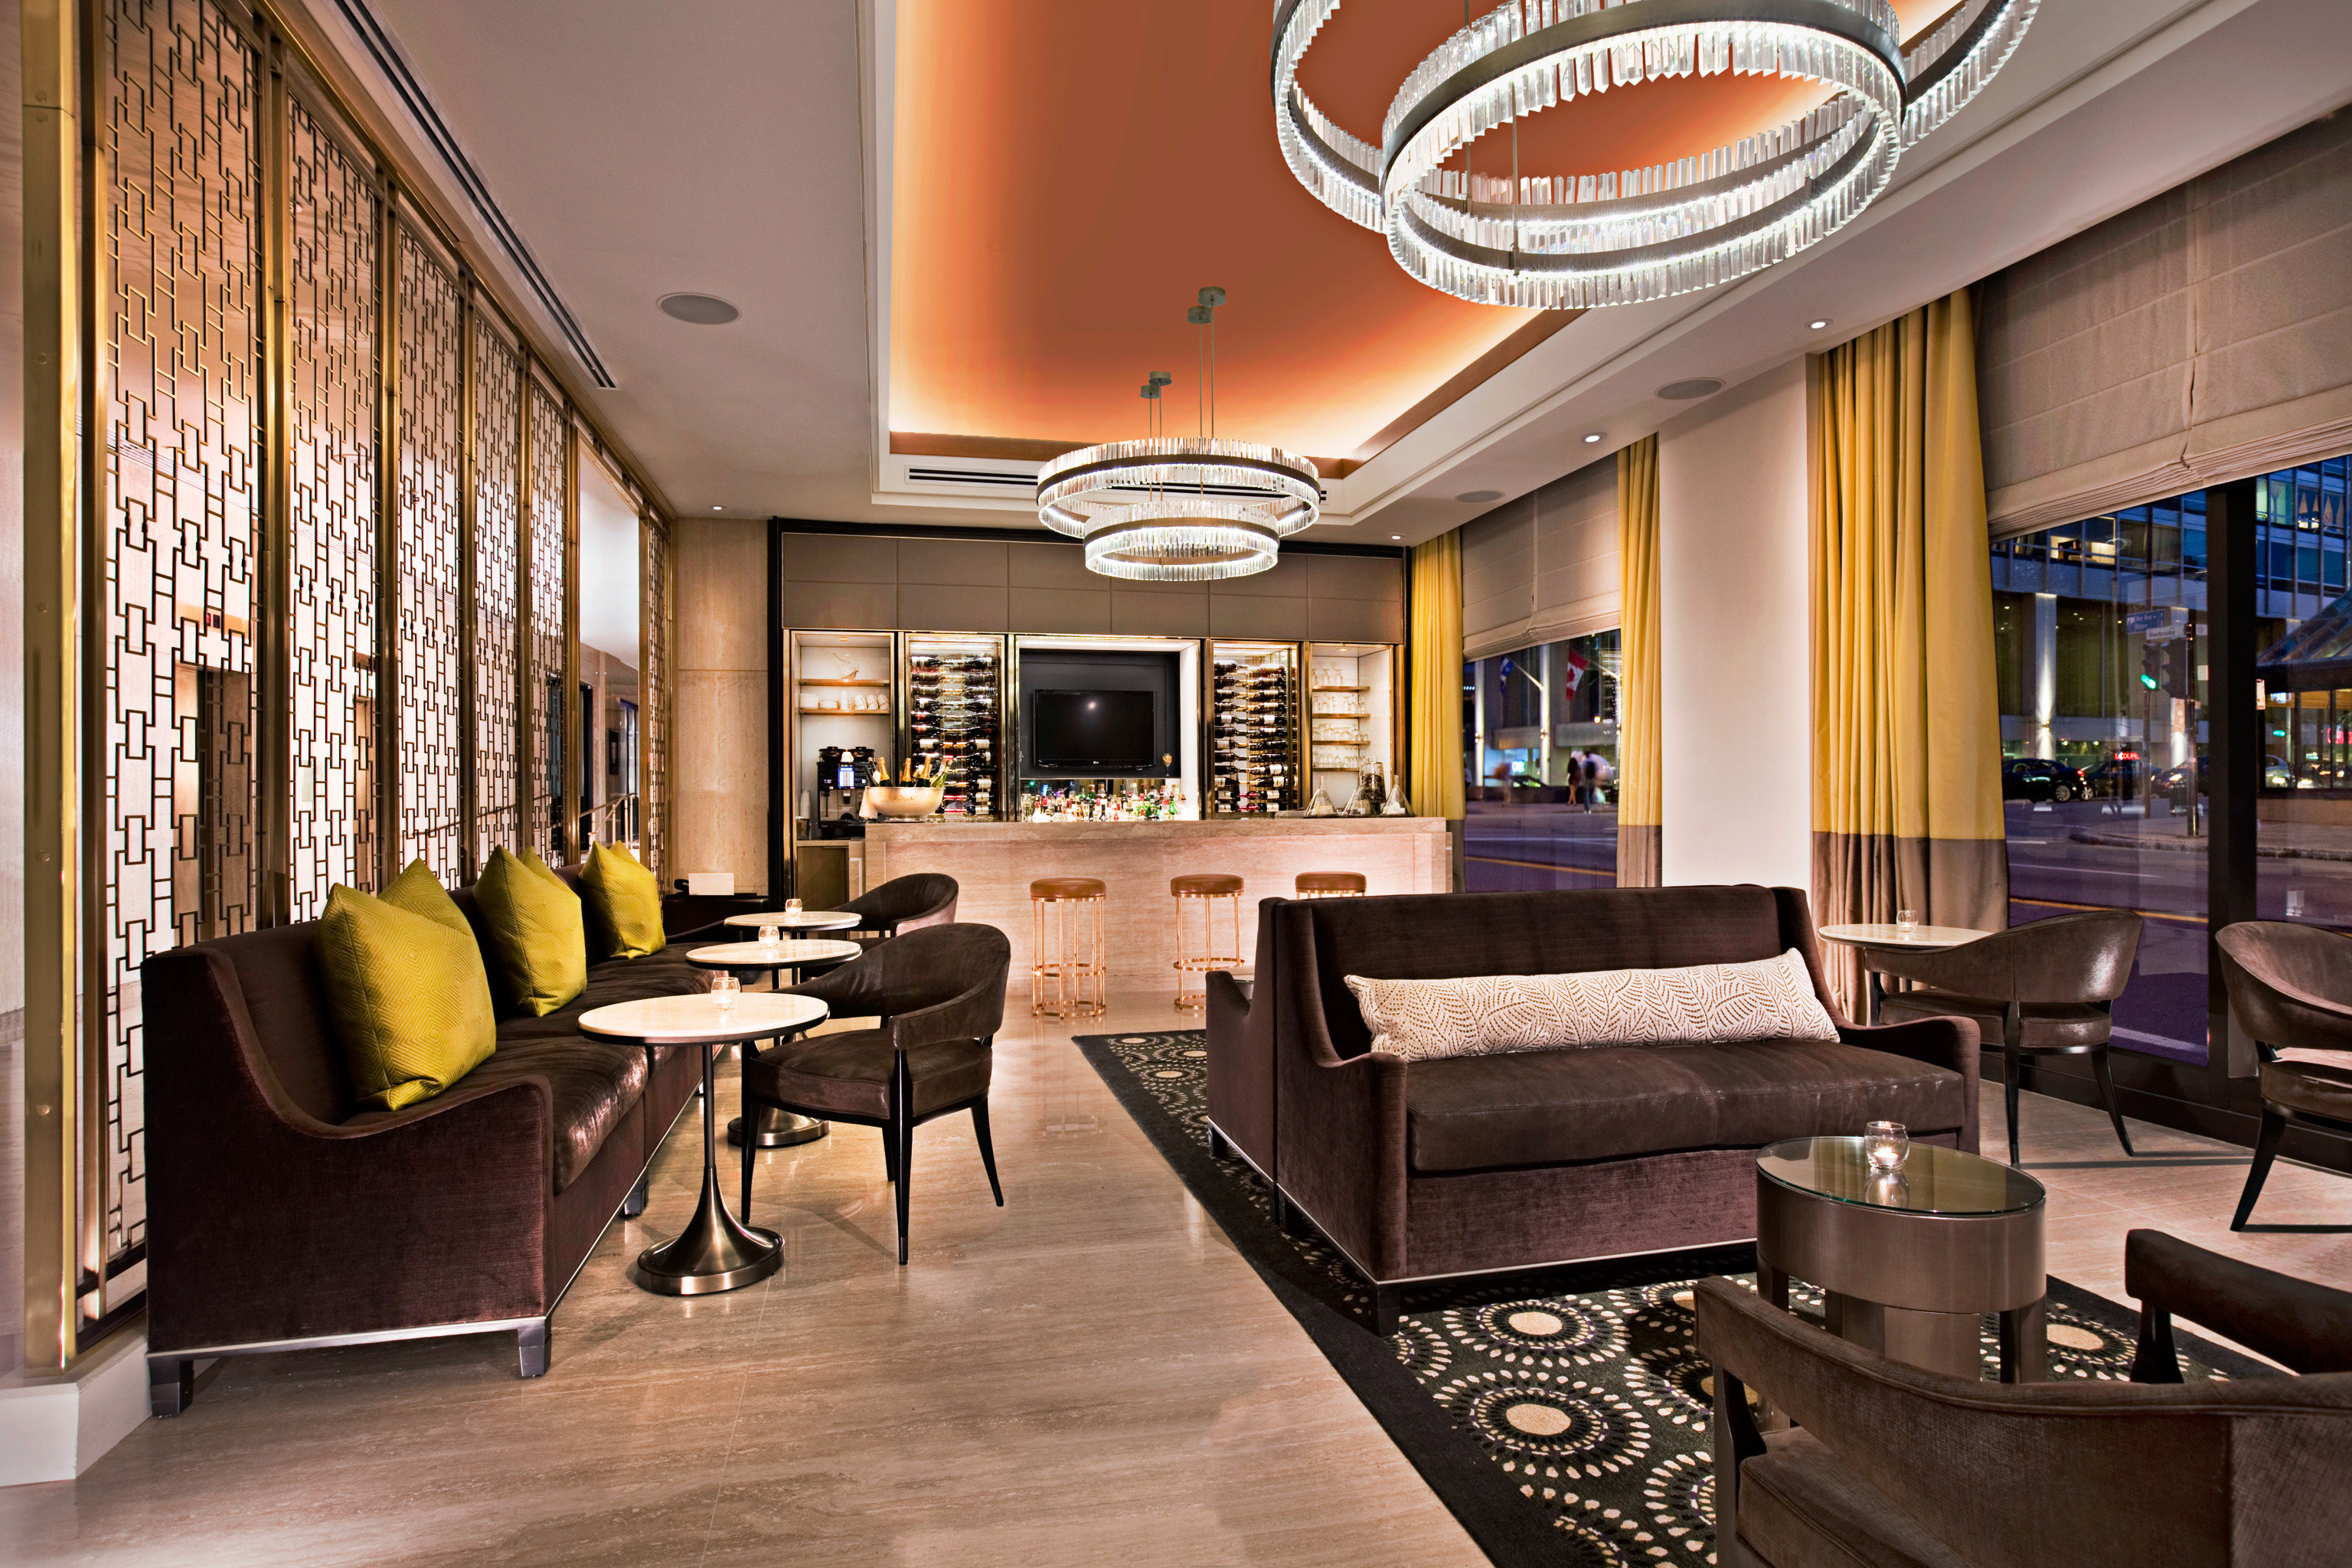 Bar City Dining Drink Eat Modern Nightlife Lobby property living room home condominium recreation room mansion Suite